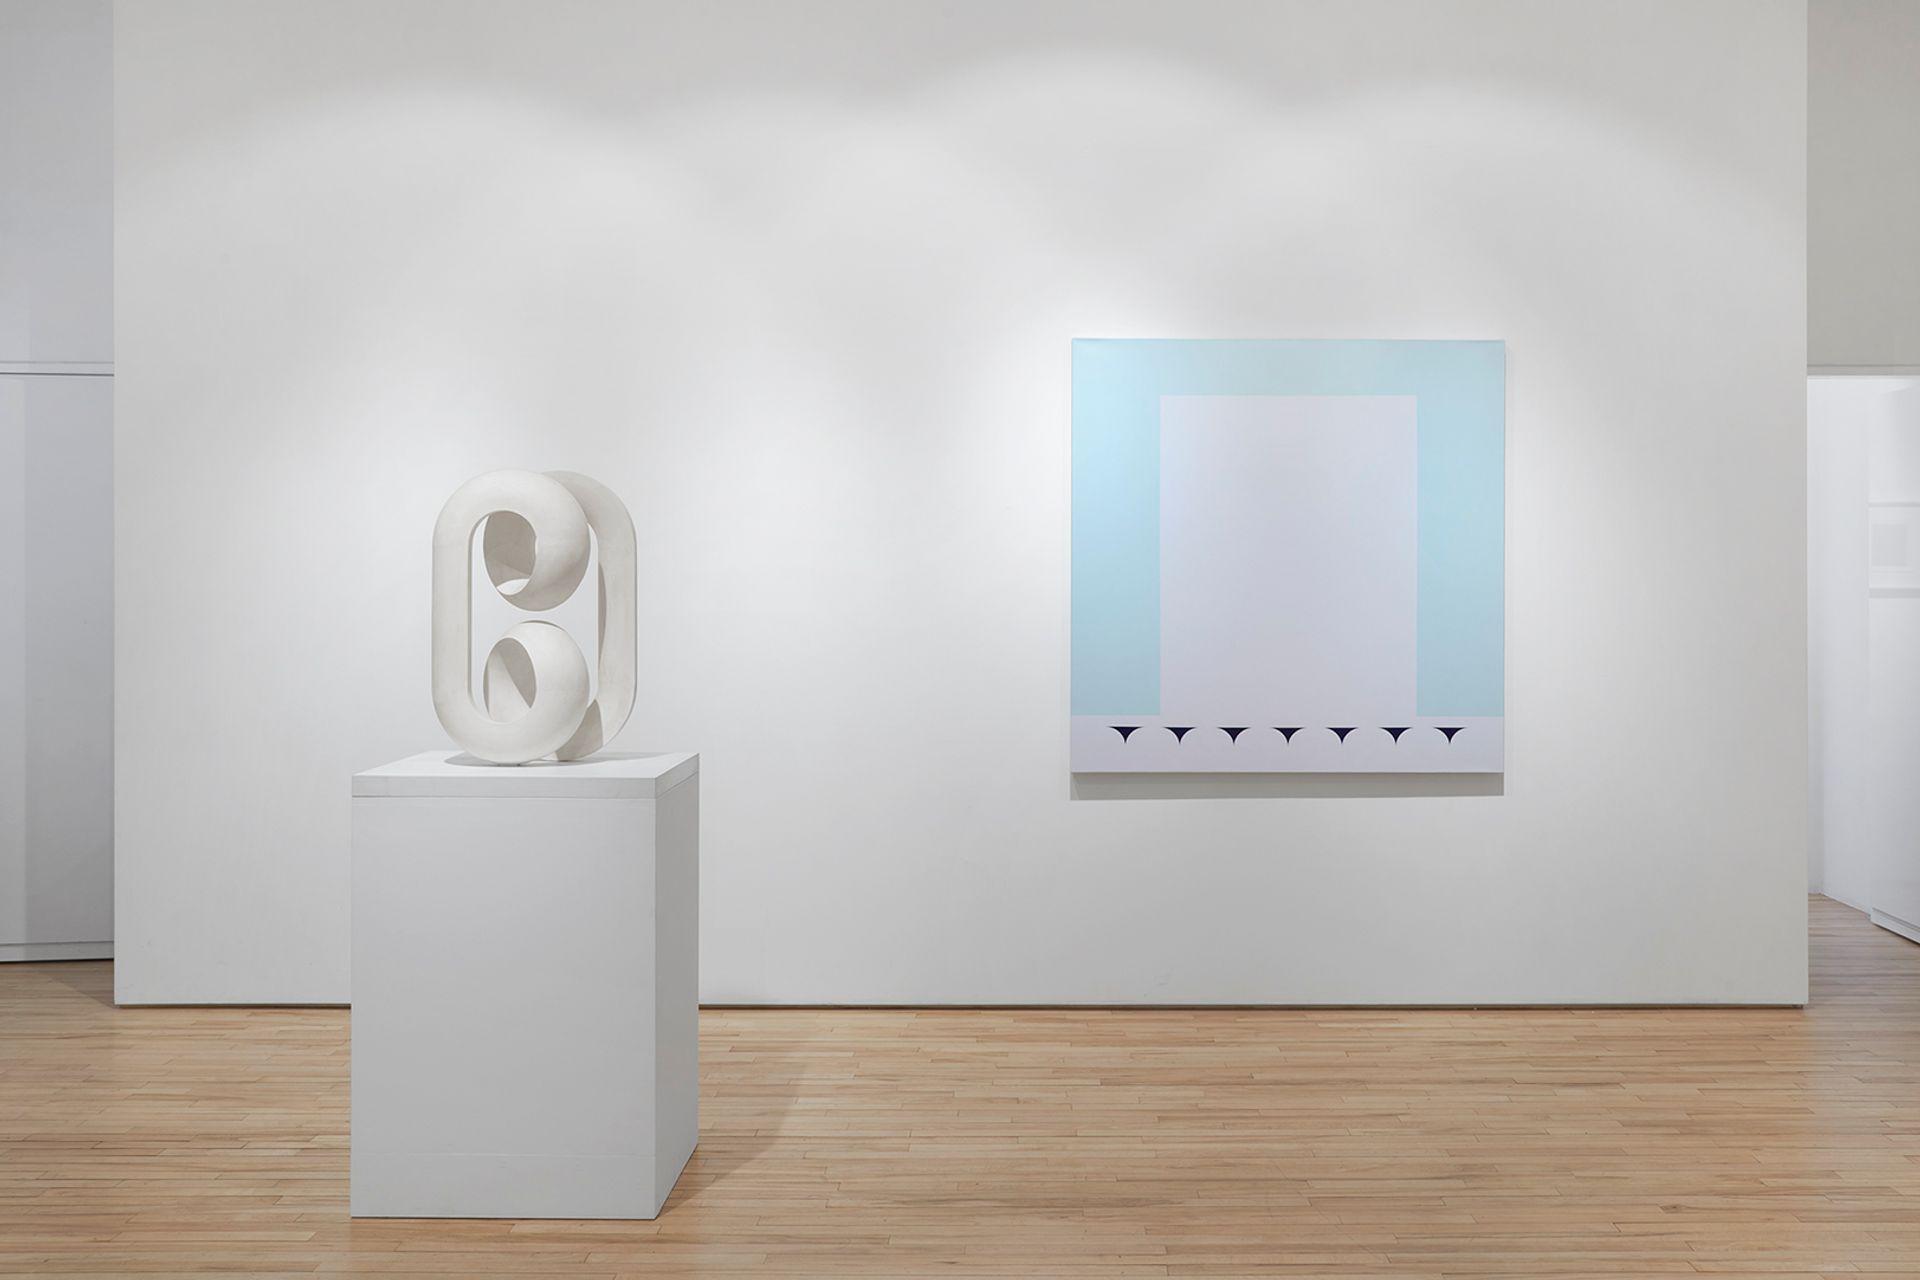 Installation view, Correspondences, Frestonian Gallery (2021) Courtesy of Frestonian Gallery